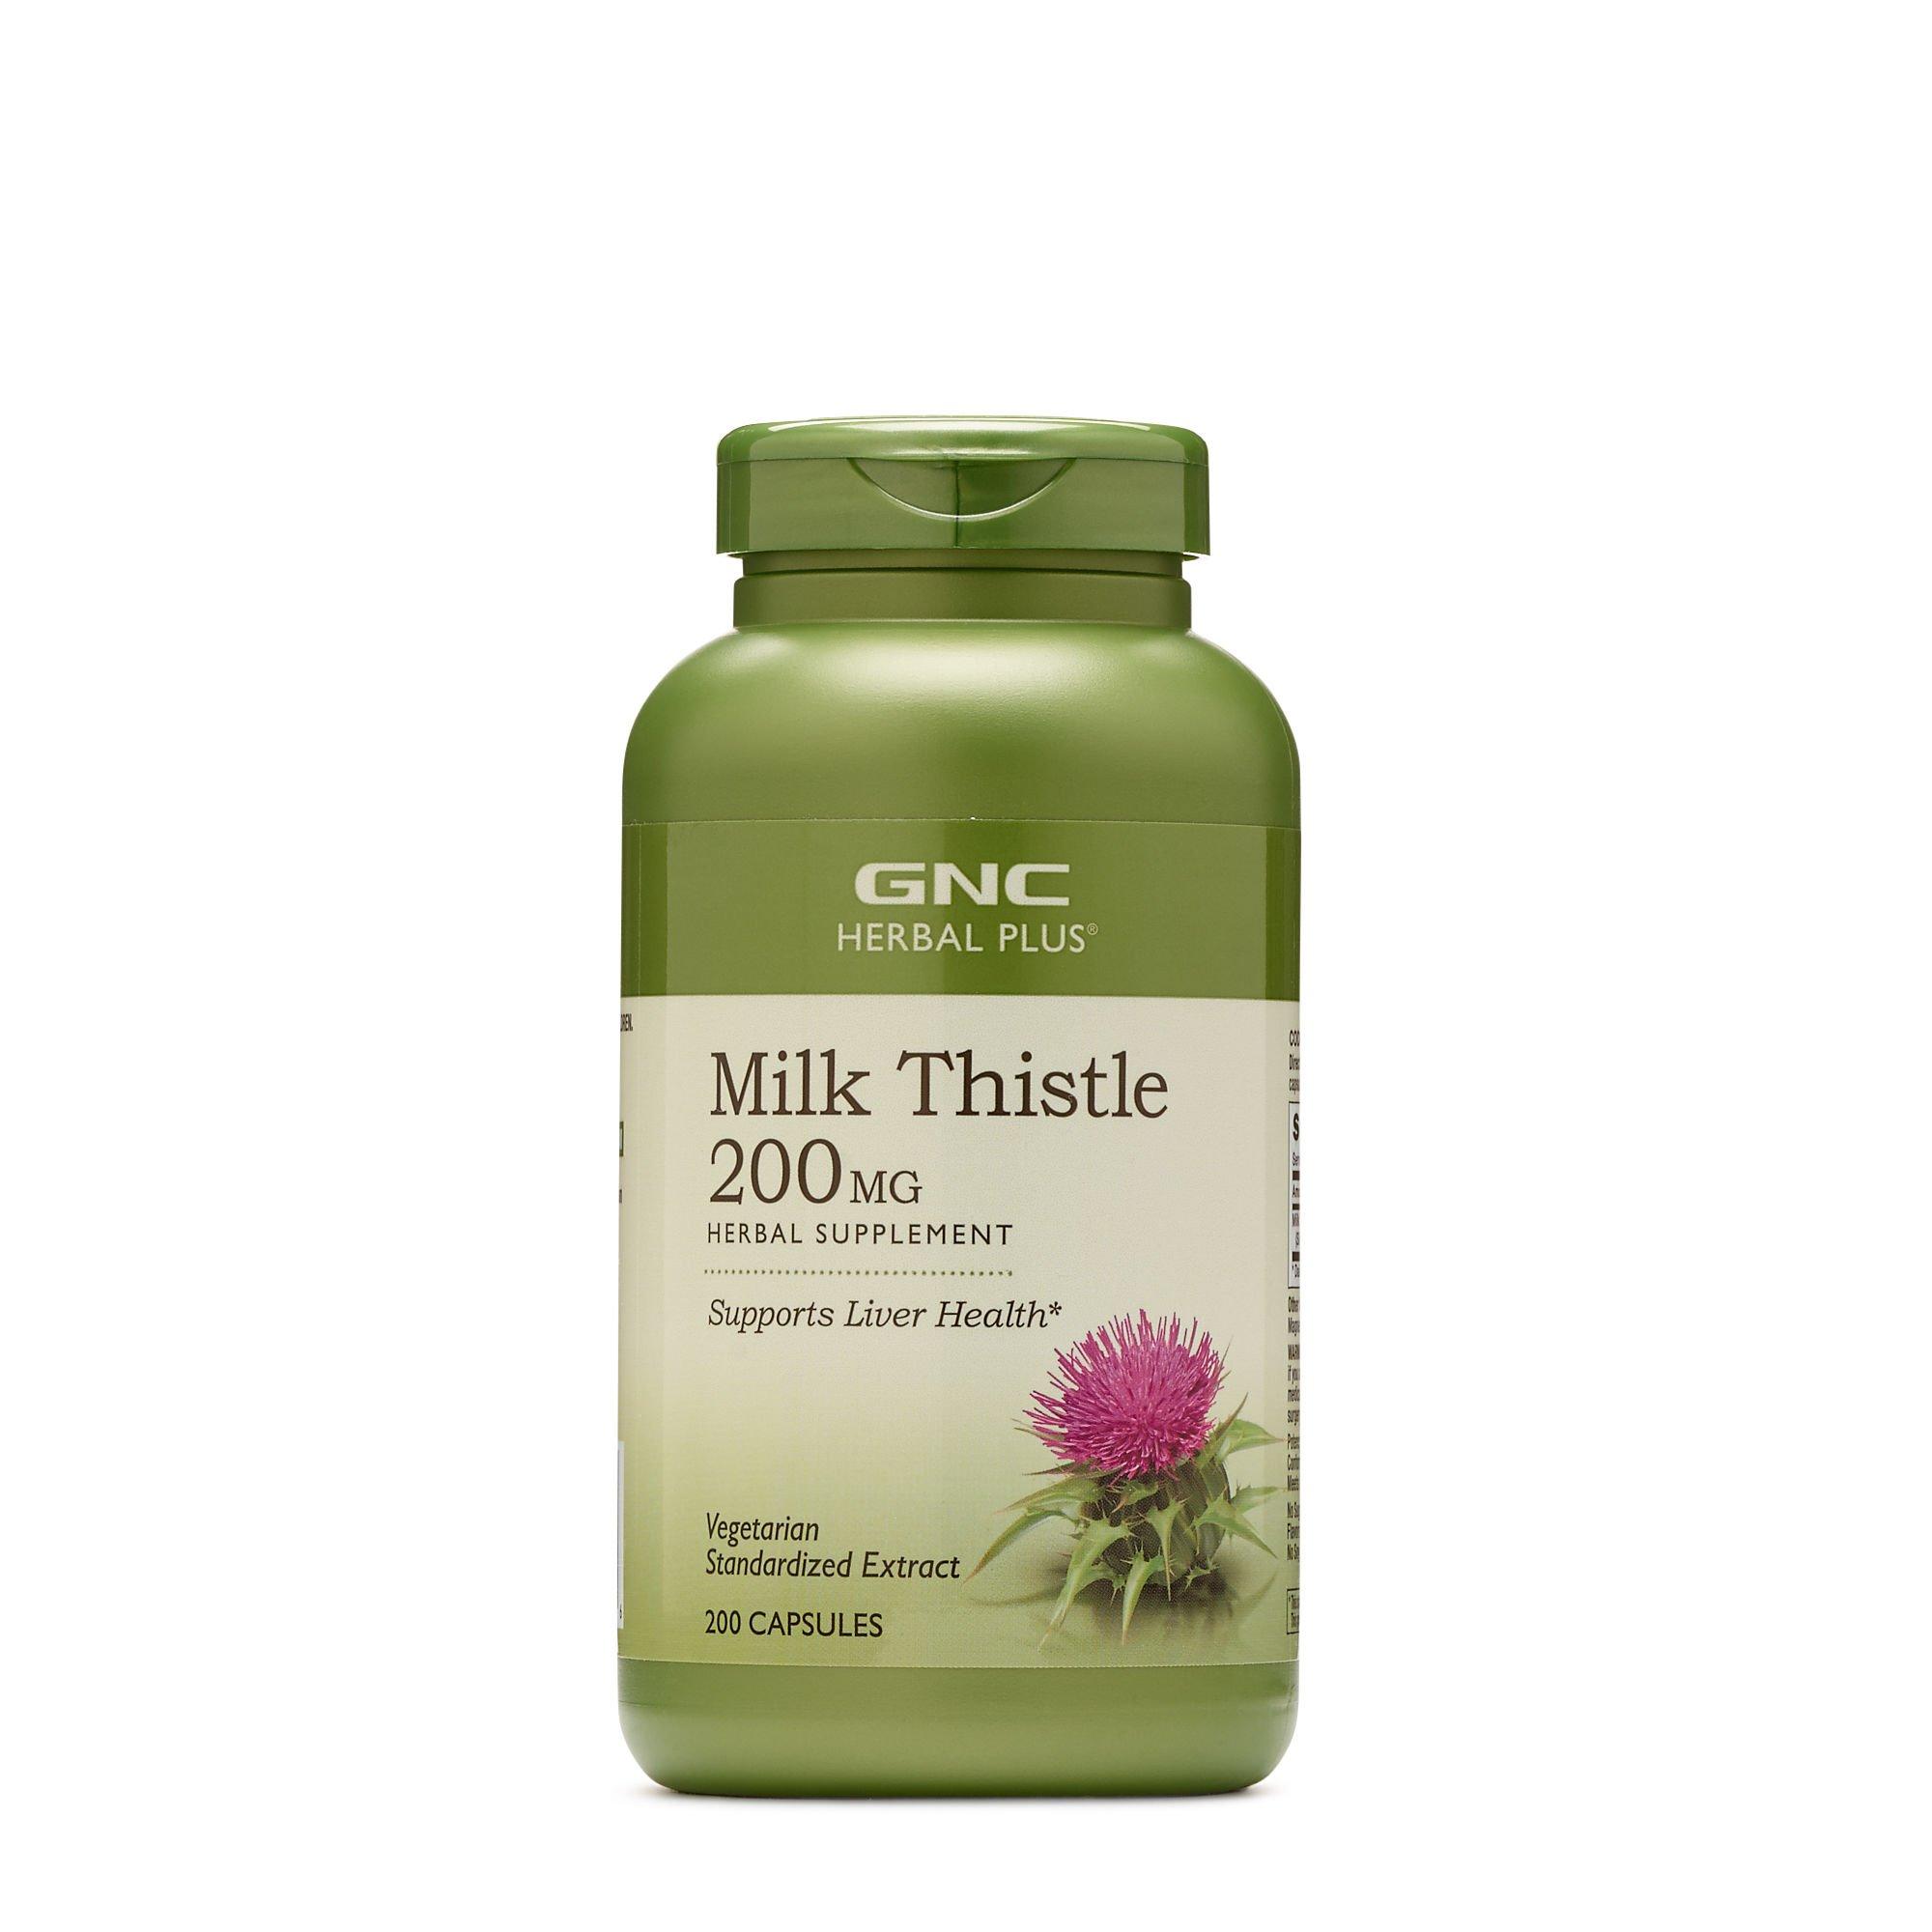 GNC Herbal Plus Milk Thistle 200 MG 200 caps